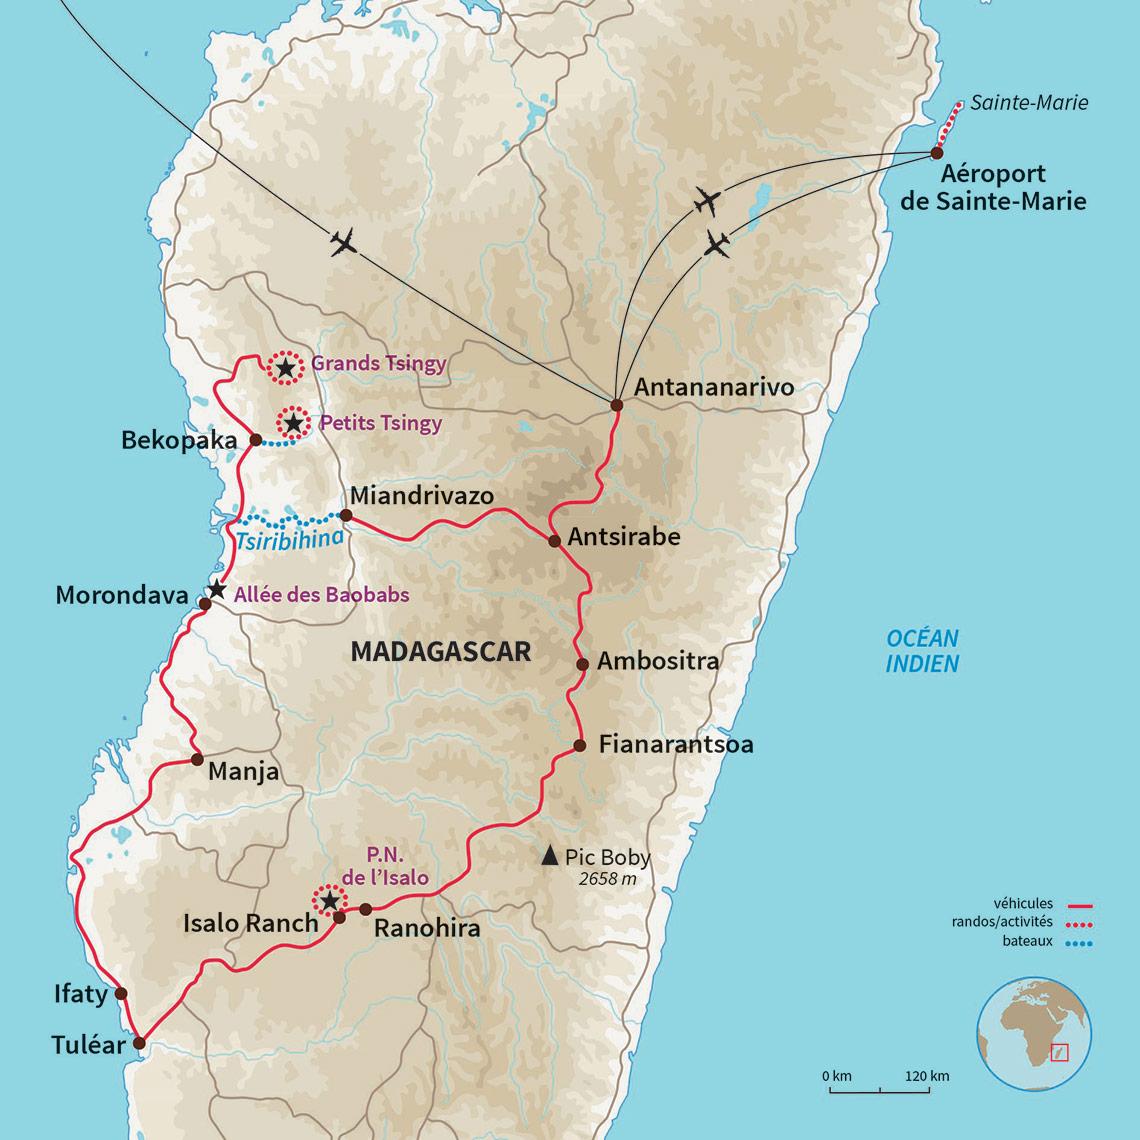 Vitesse datant Antananarivo